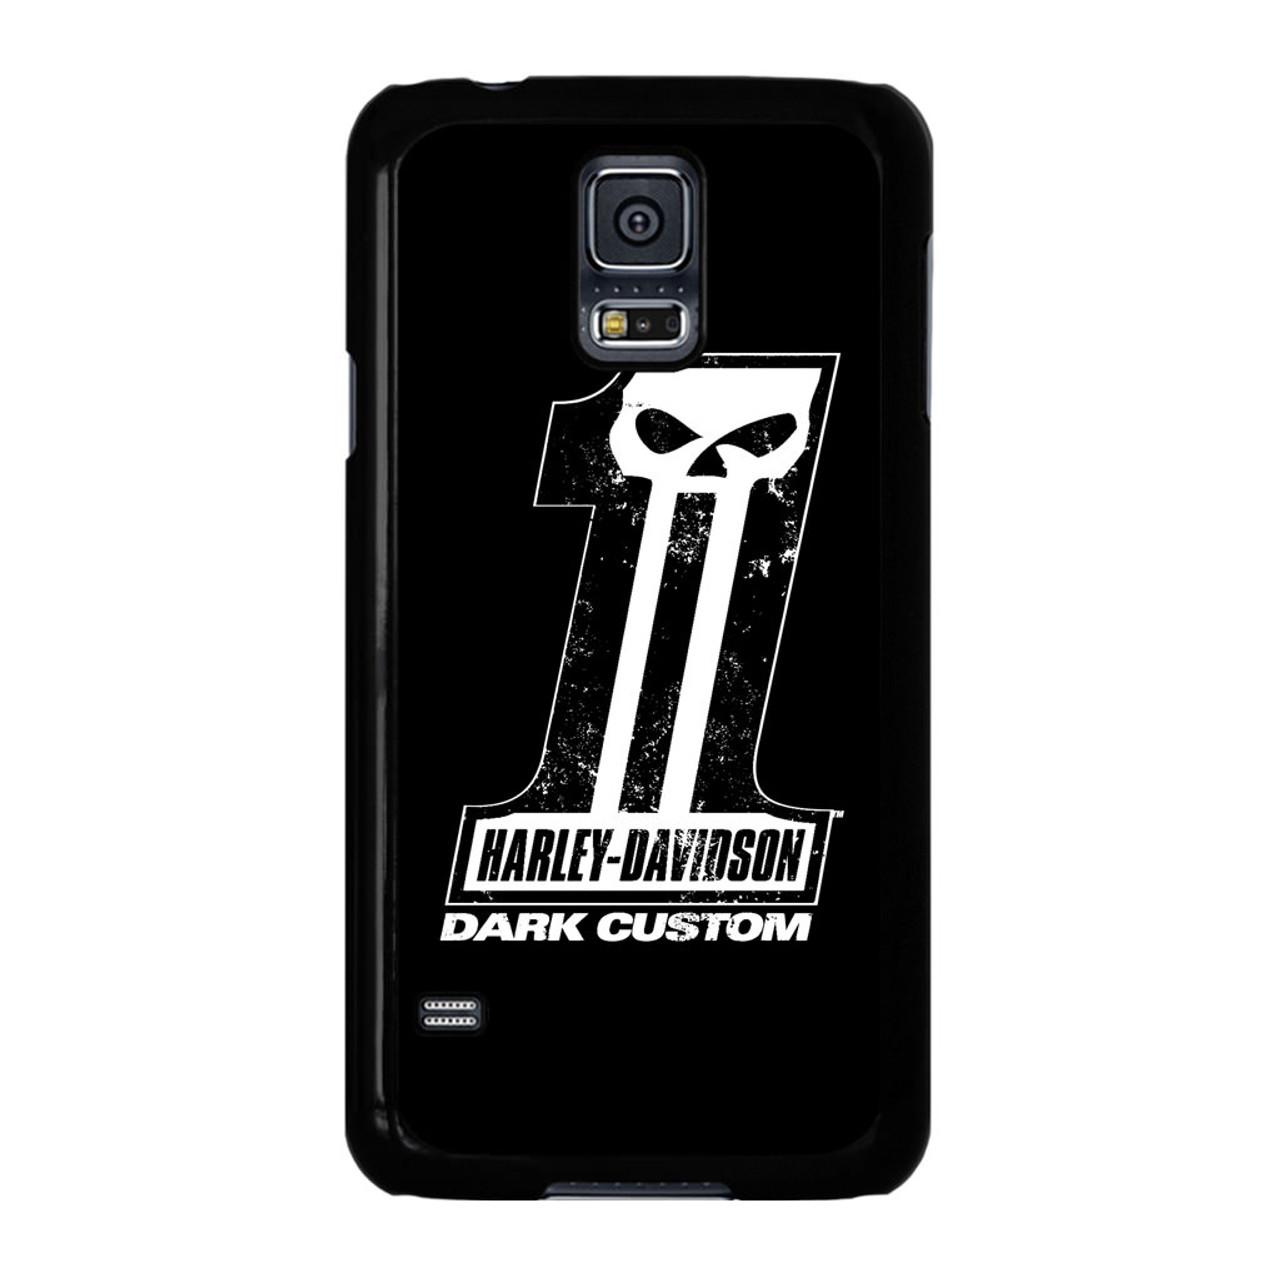 official photos 1597b b87a0 Harley Davidson Dark Custom Samsung Galaxy S5 Case